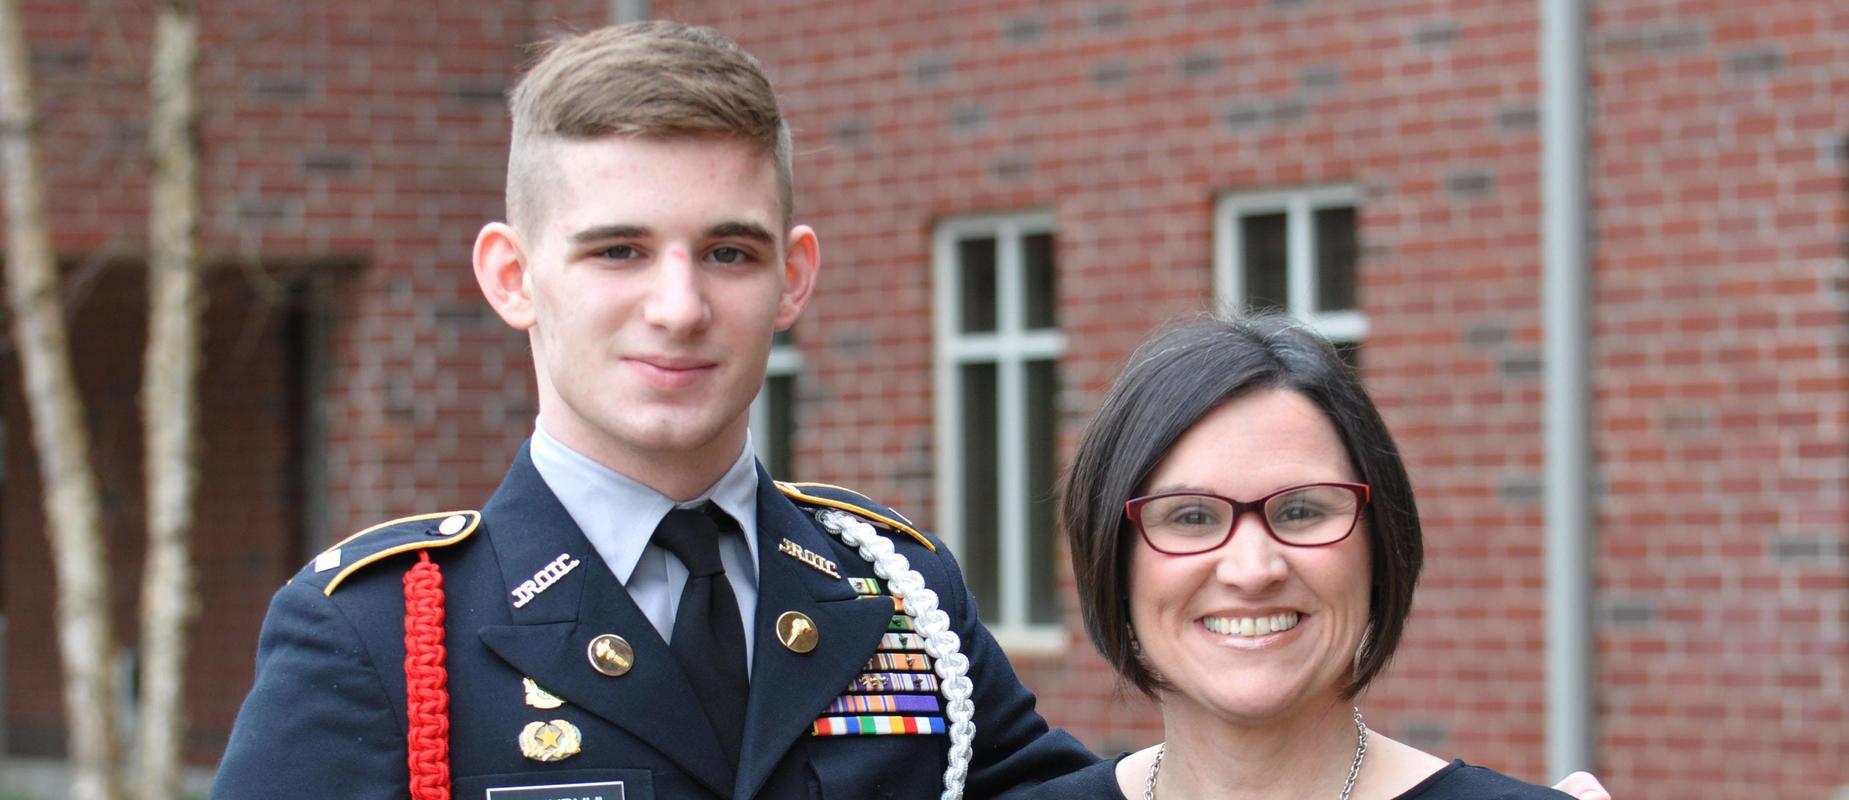 Brendan Luginbuhl named STAR student at AHS.